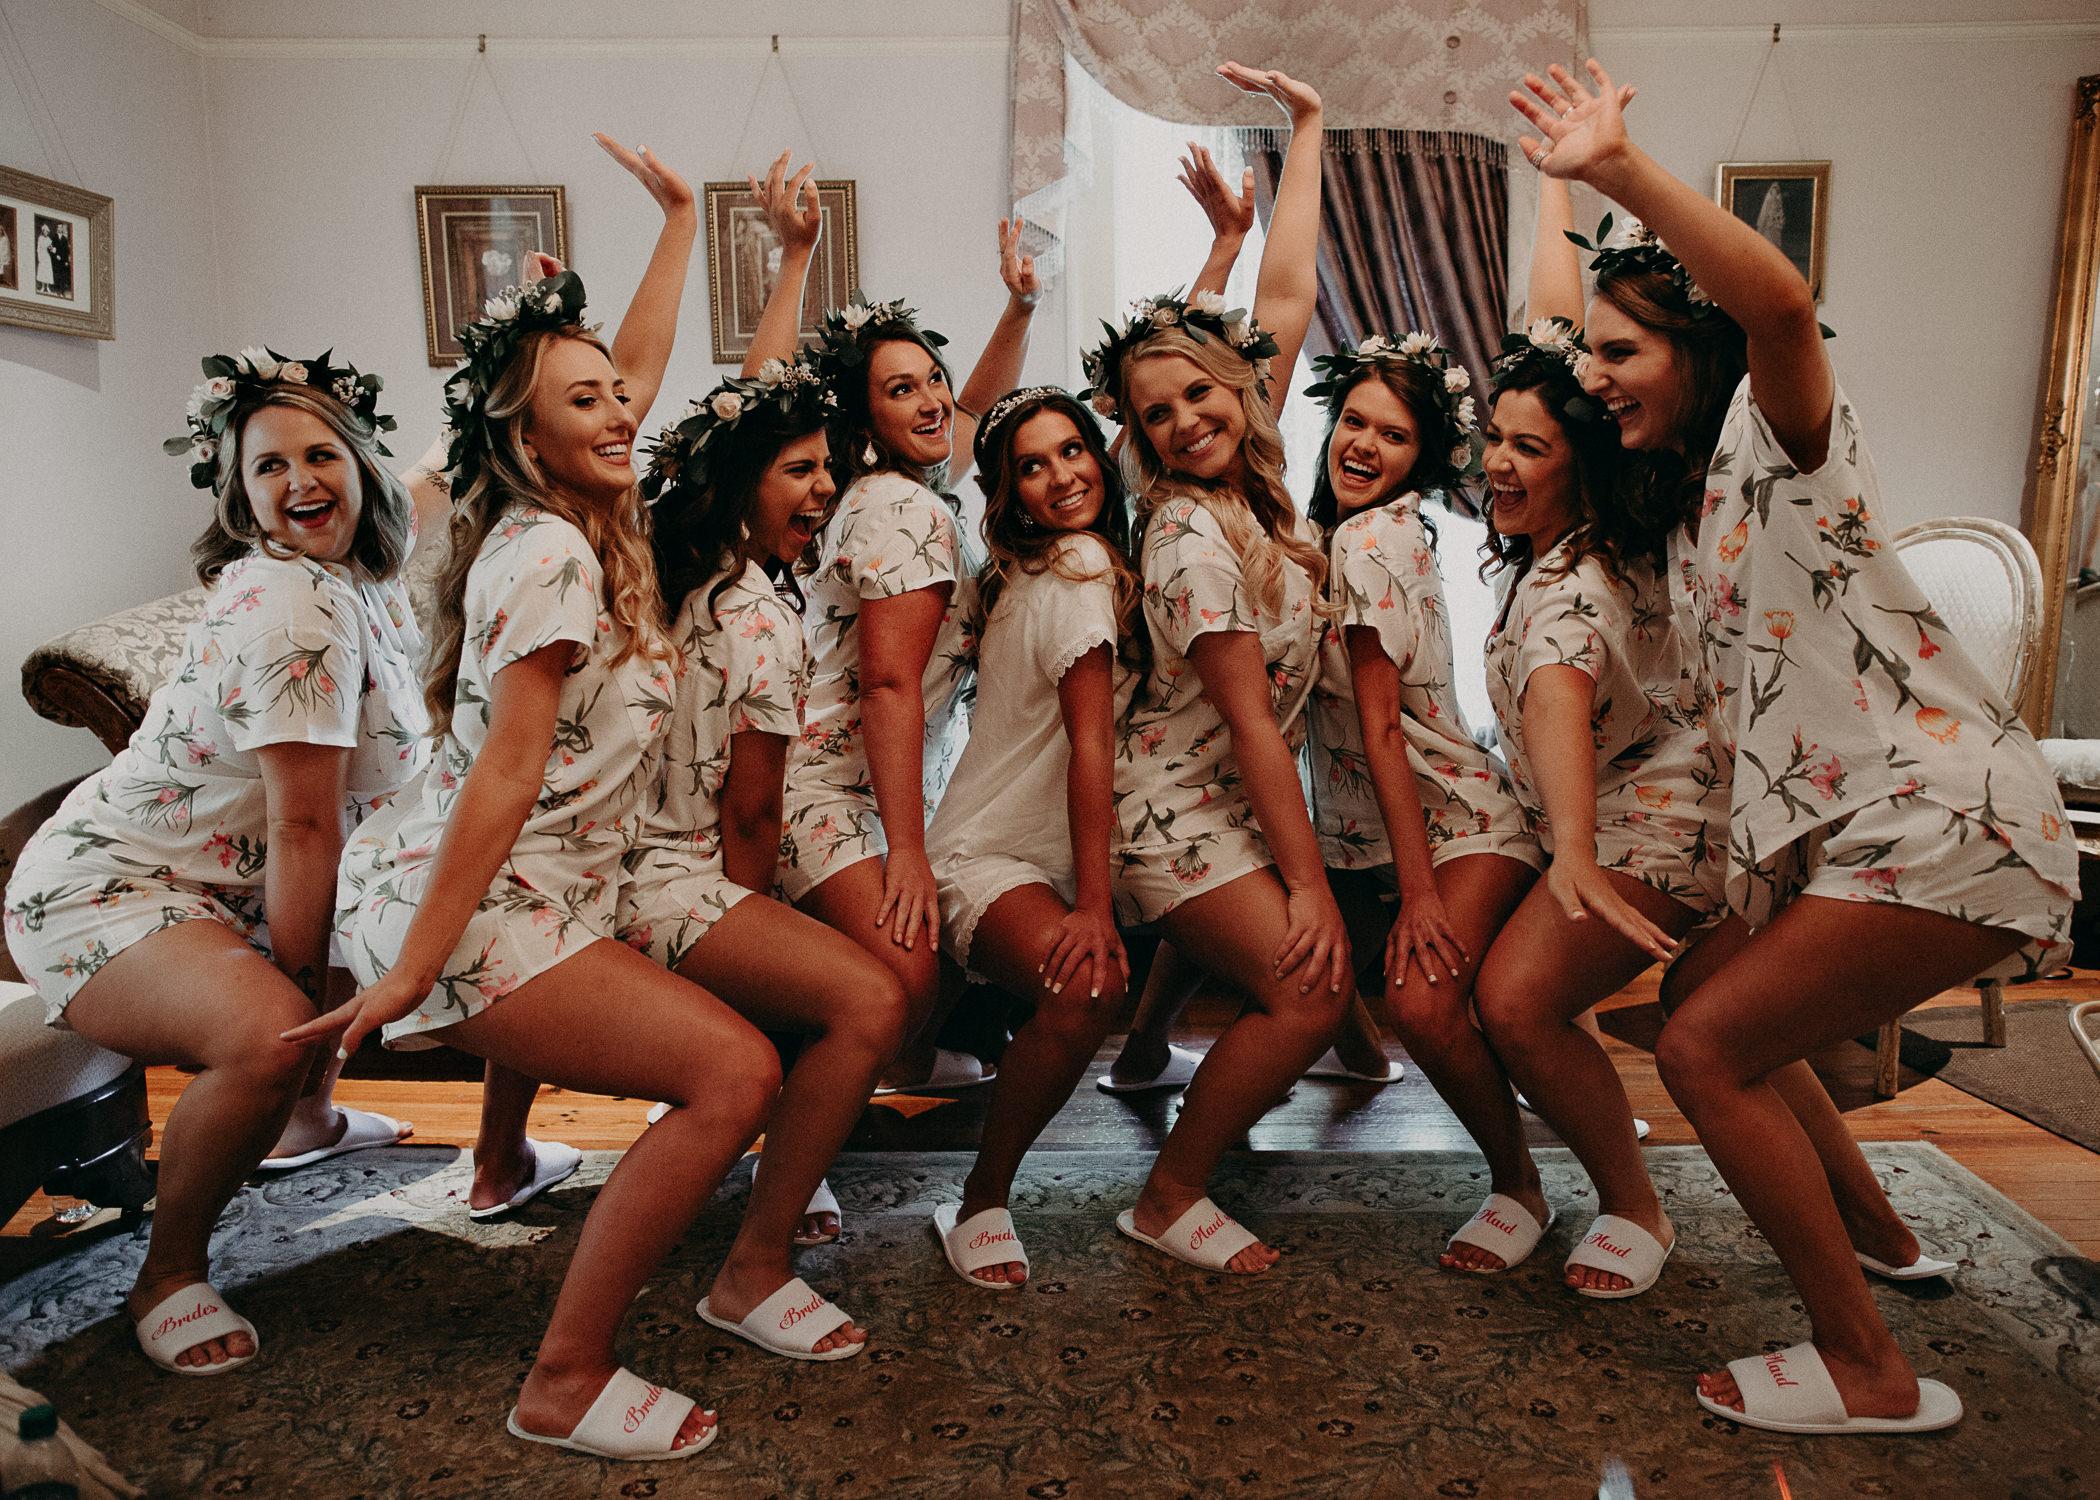 10Carl House Wedding Venue Ga, Atlanta Wedding Photographer - Boho, Bohemian, Junebug Weddings, Vintage, Retro, Trendy. Aline Marin Photography. .jpg